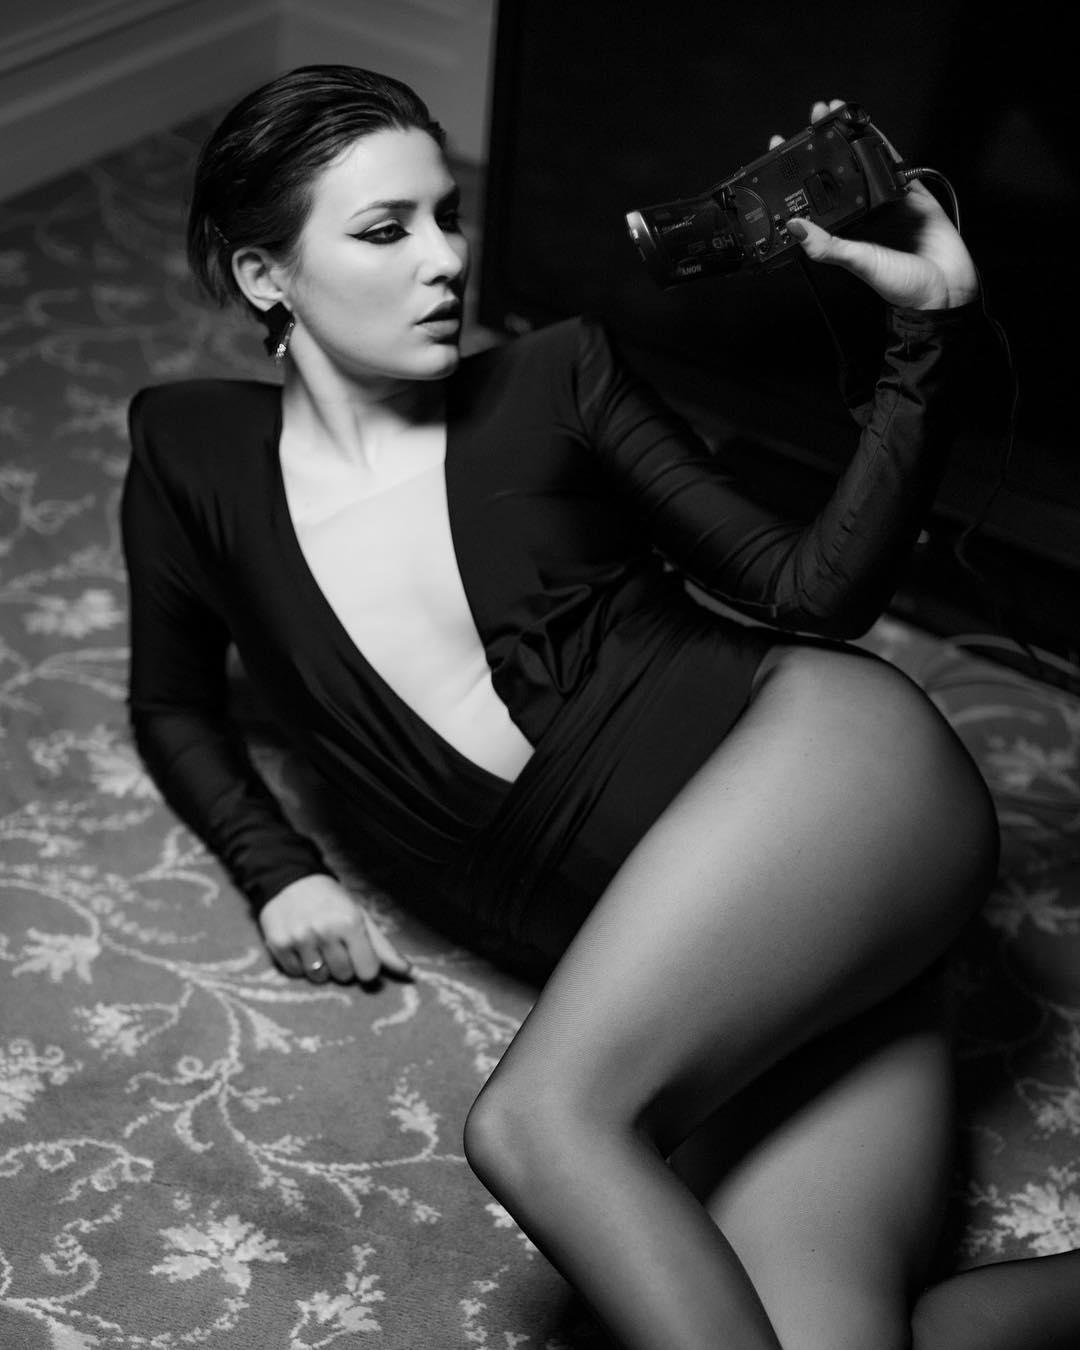 MARUV: Самые горячие фото Анны Корсун - Смотрим 1